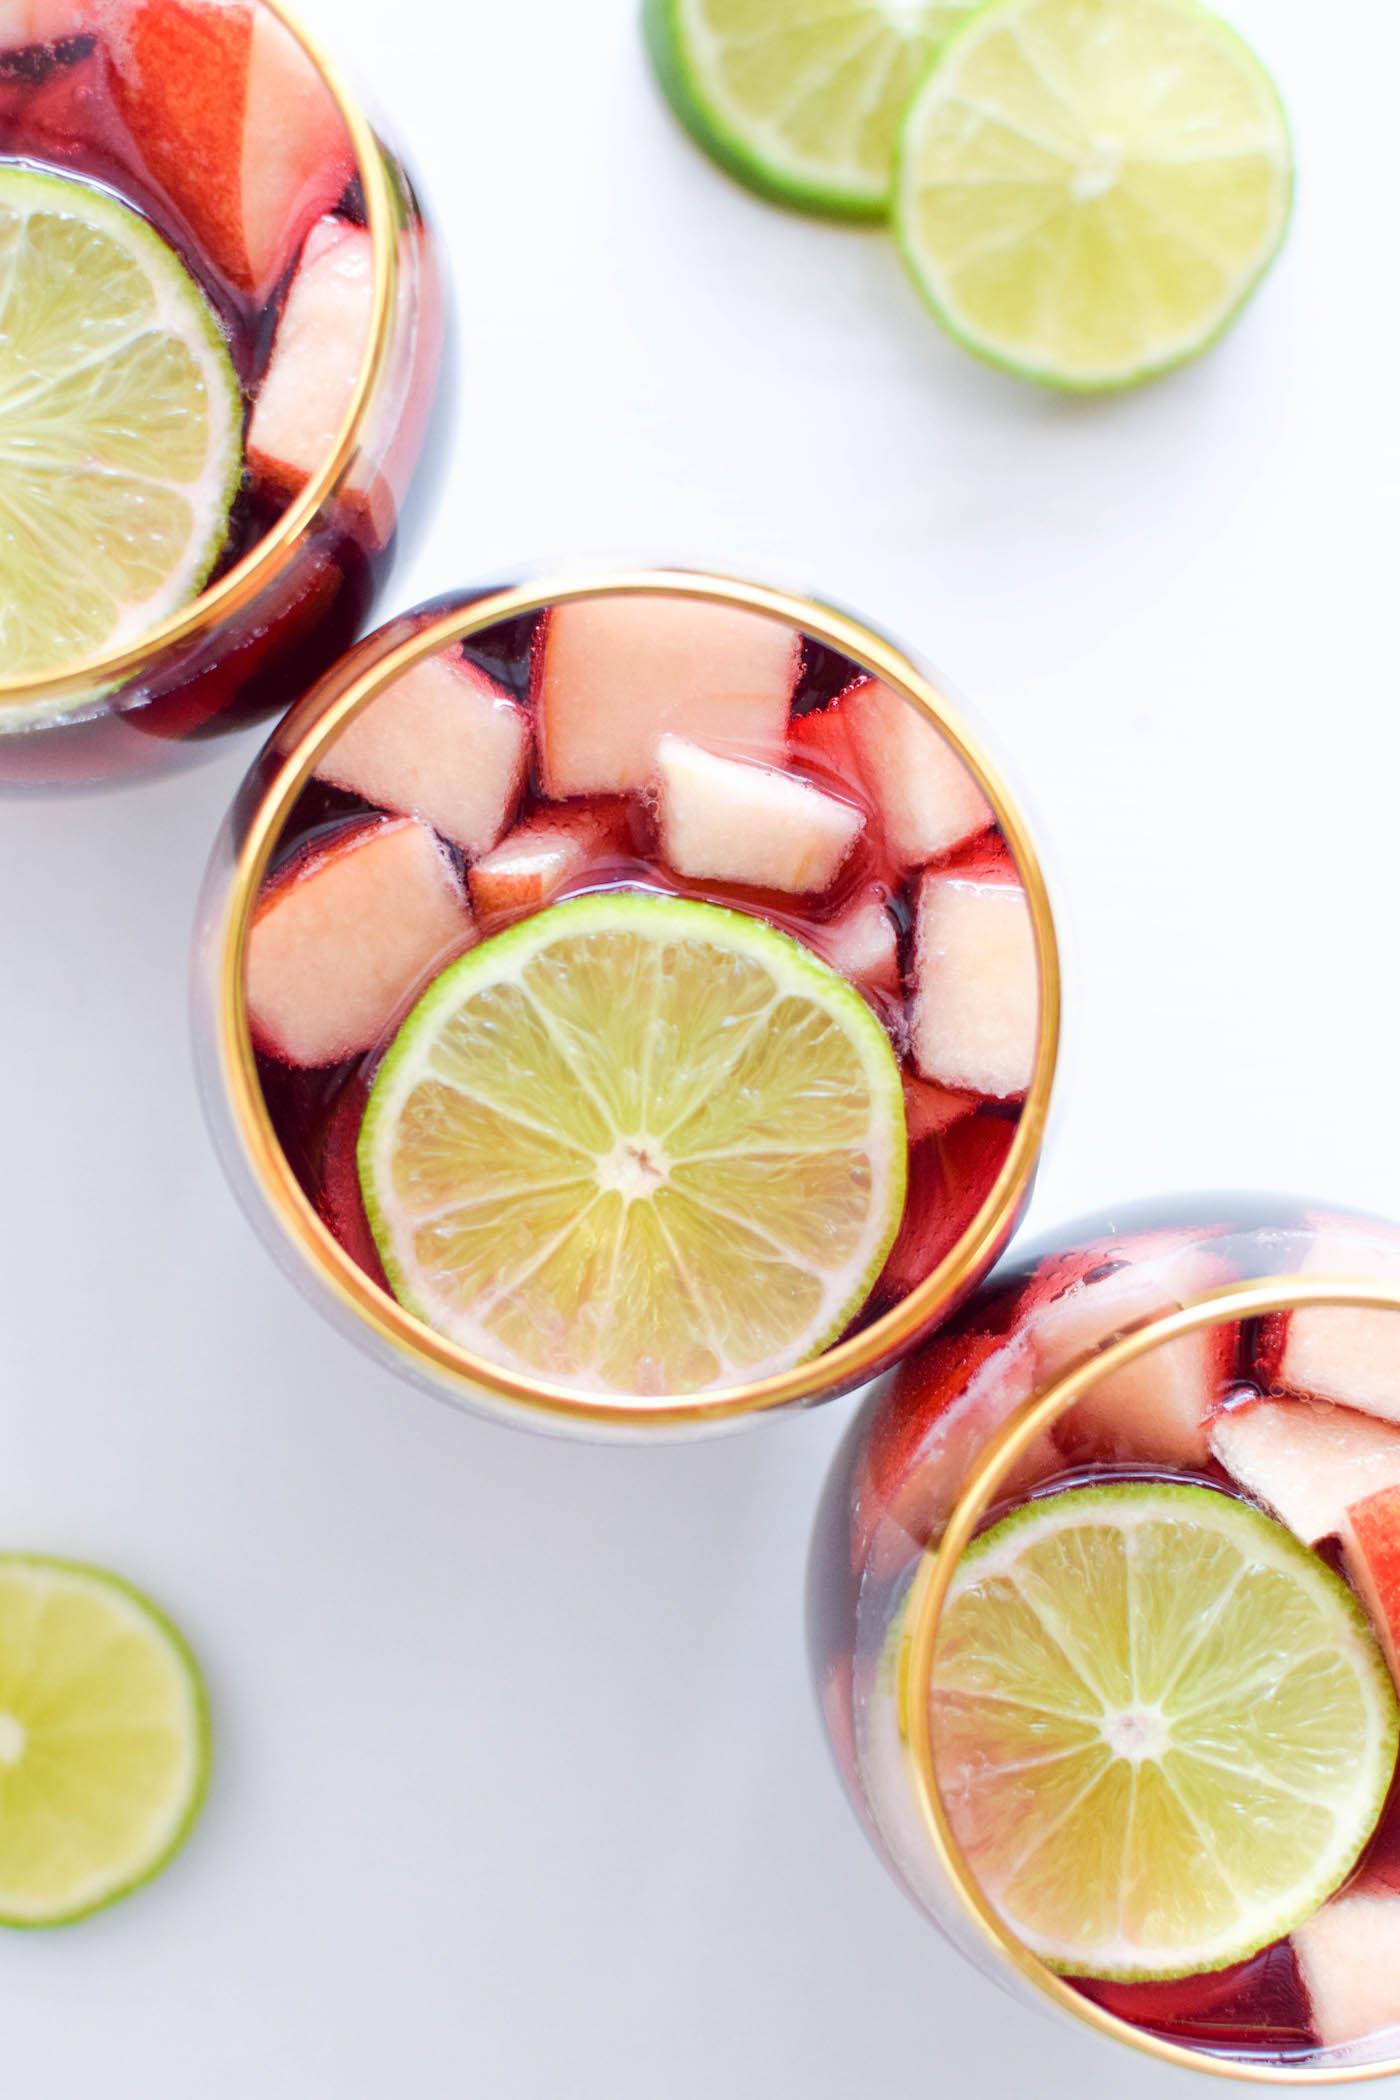 izze pomegranate sangria recipe